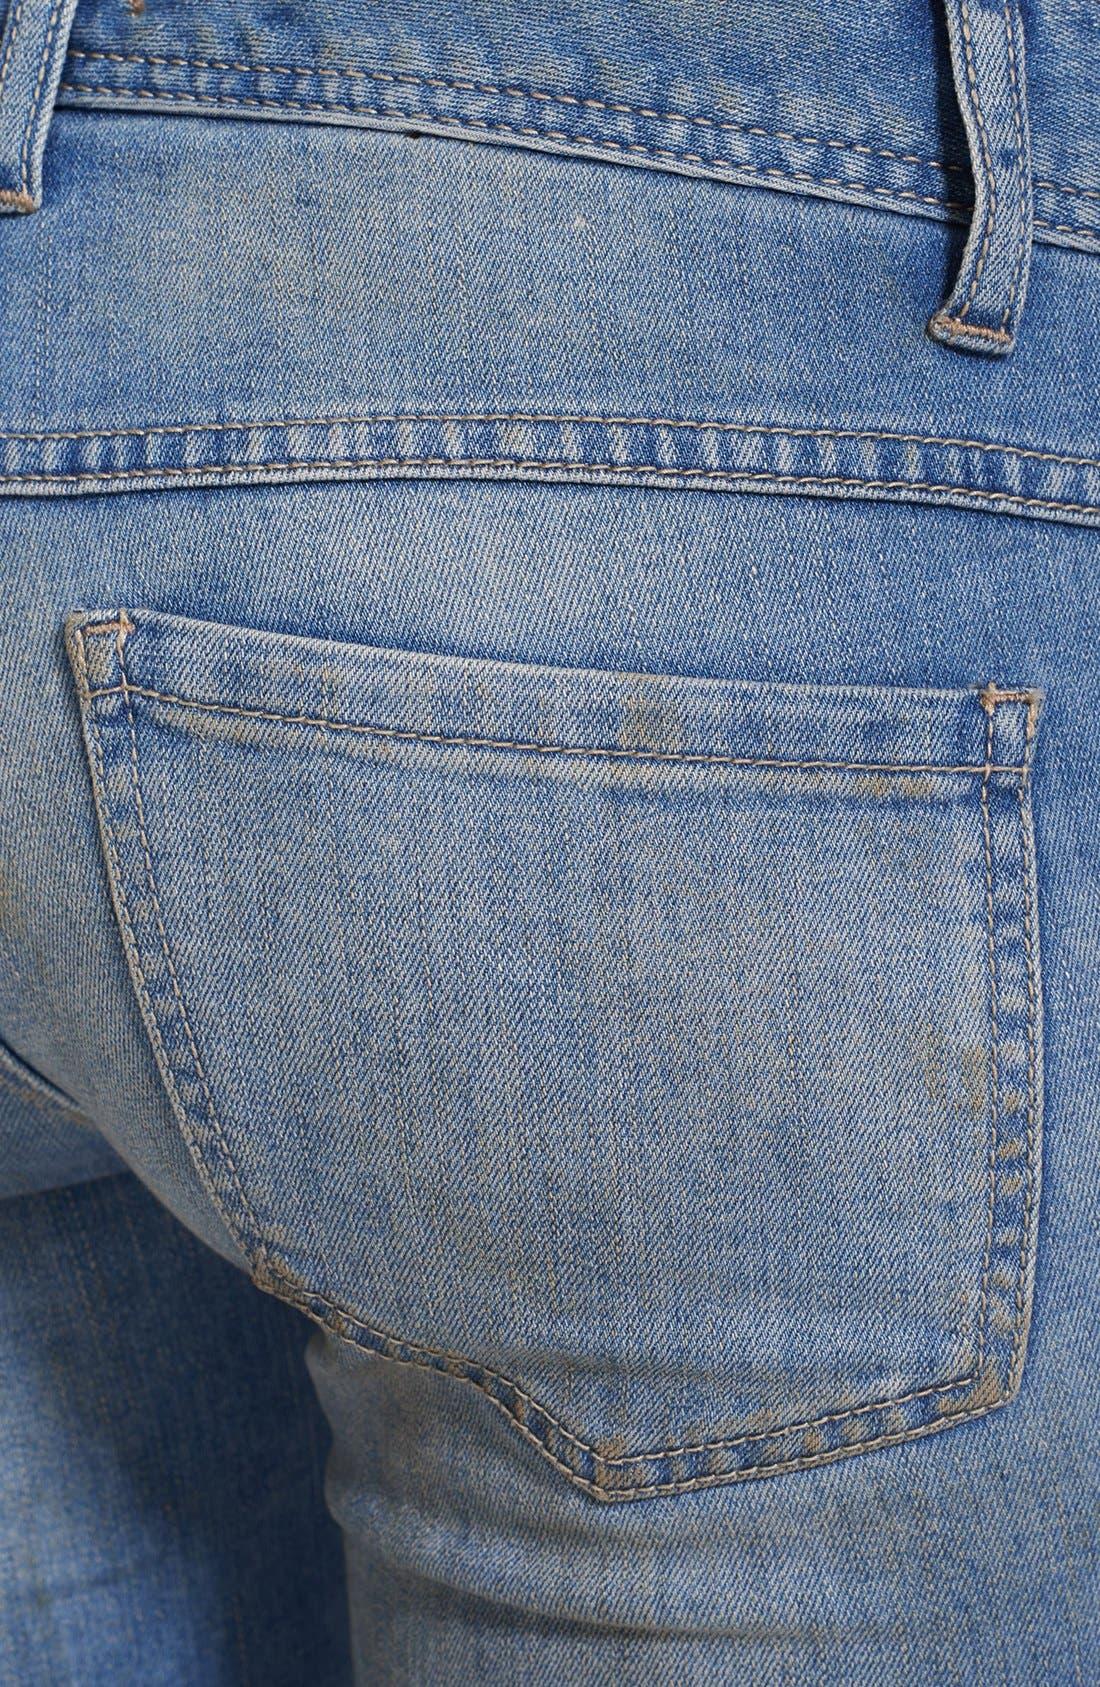 Alternate Image 3  - Free People Destroyed Skinny Ankle Jeans (Engineered Wash)